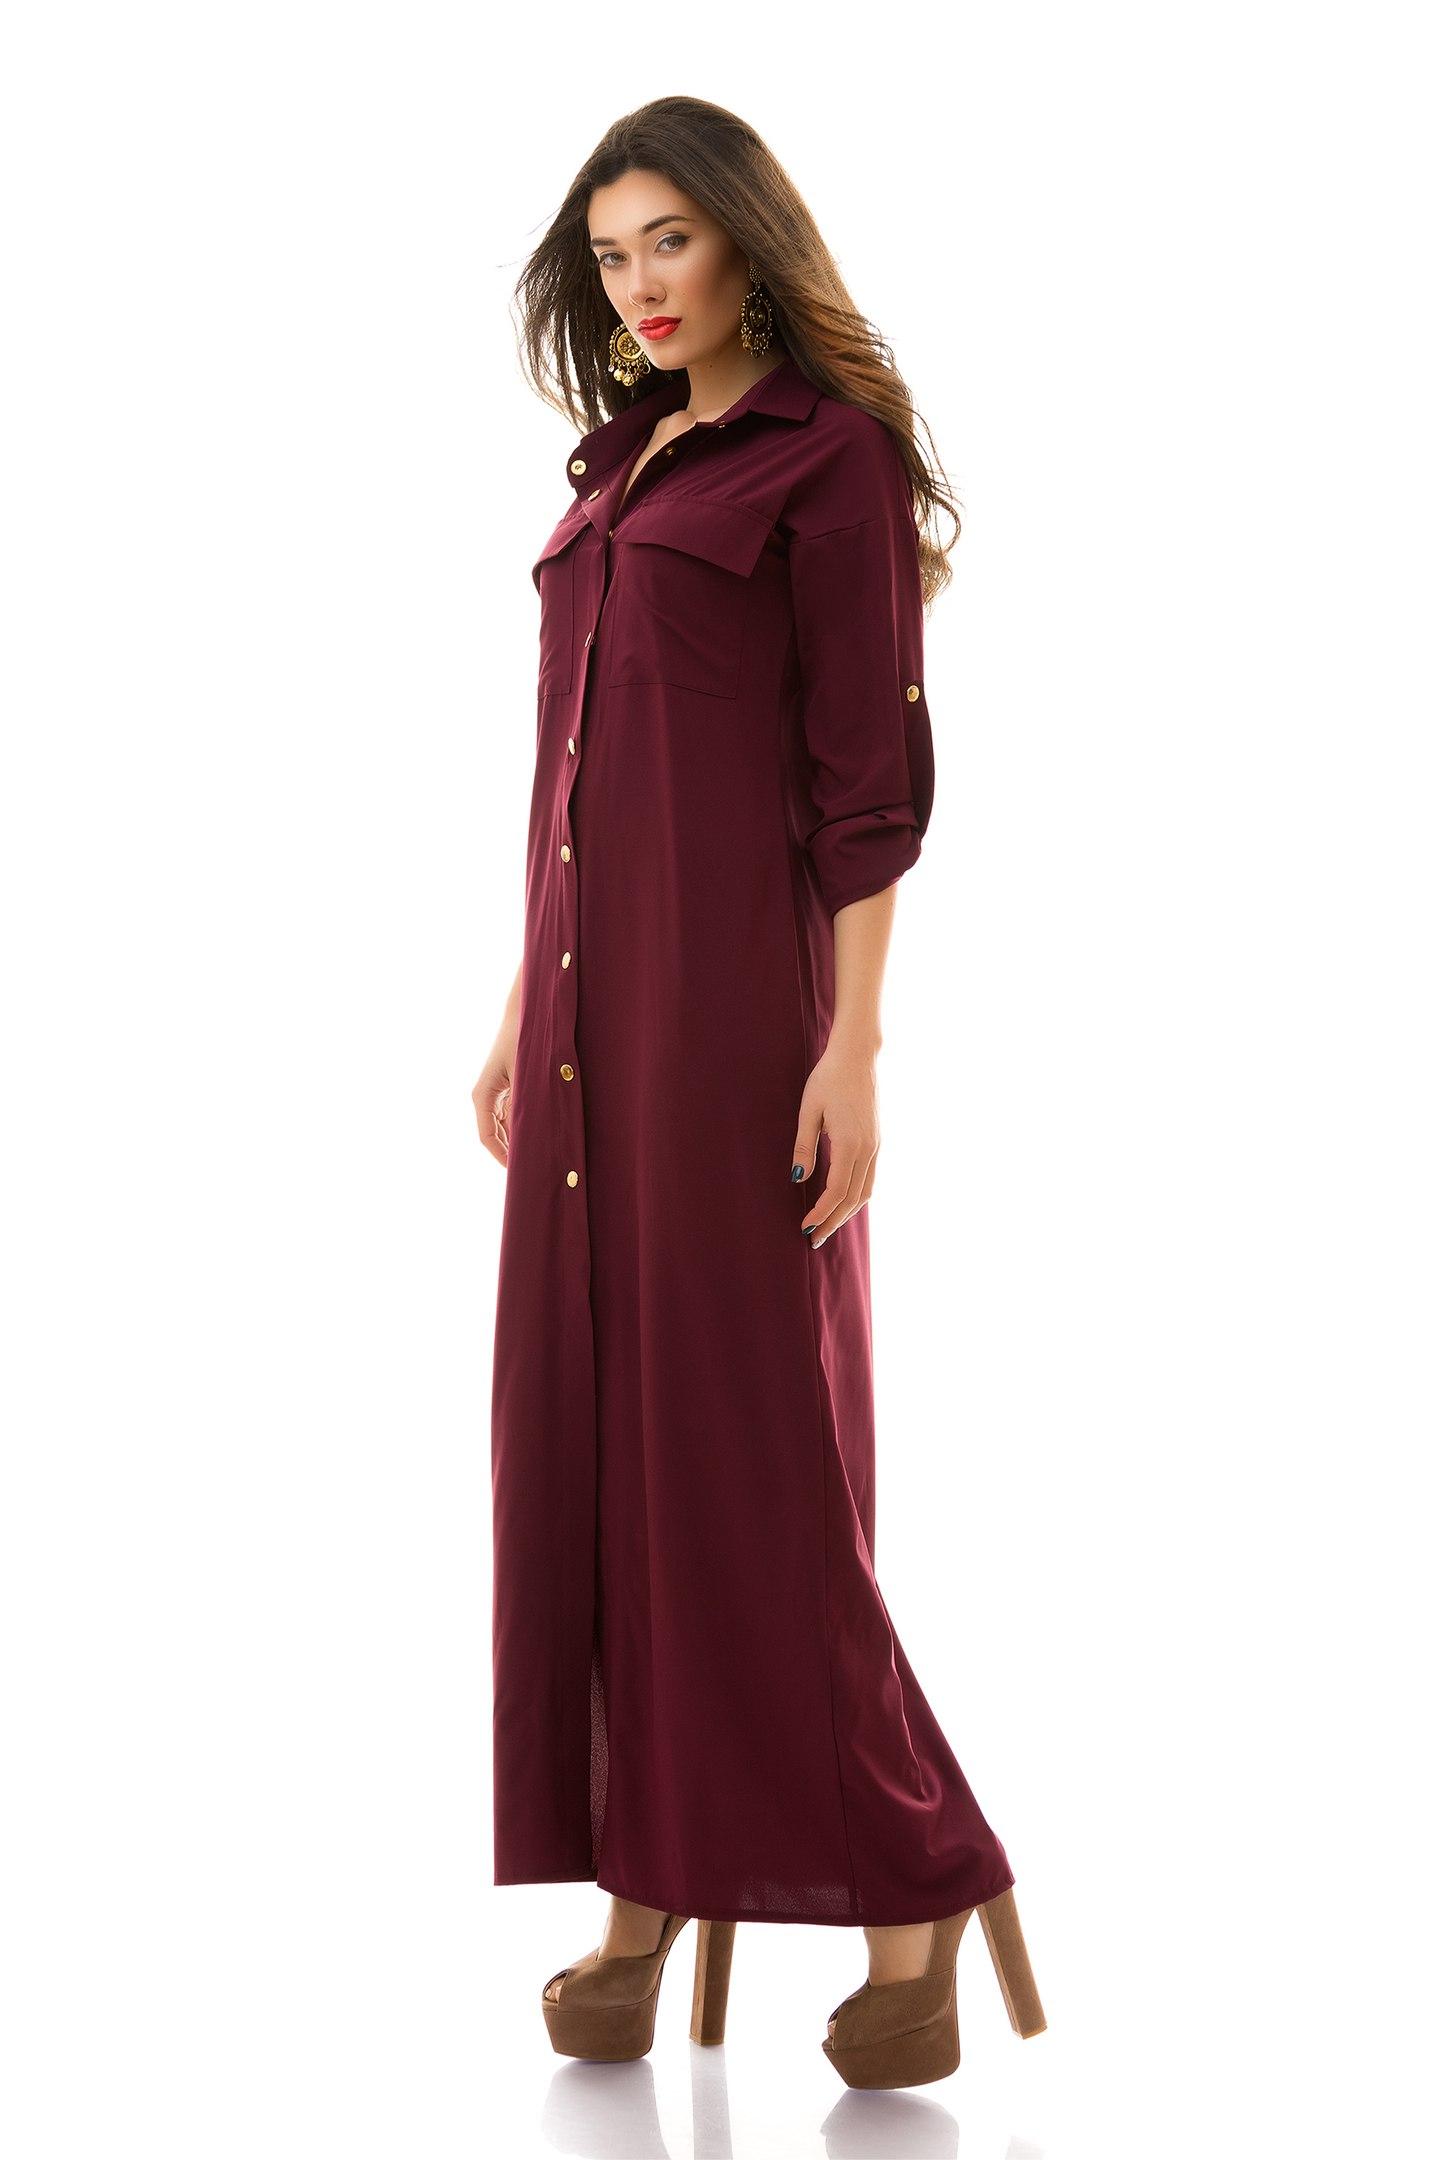 Платье женское оптом   04044747 3042-1